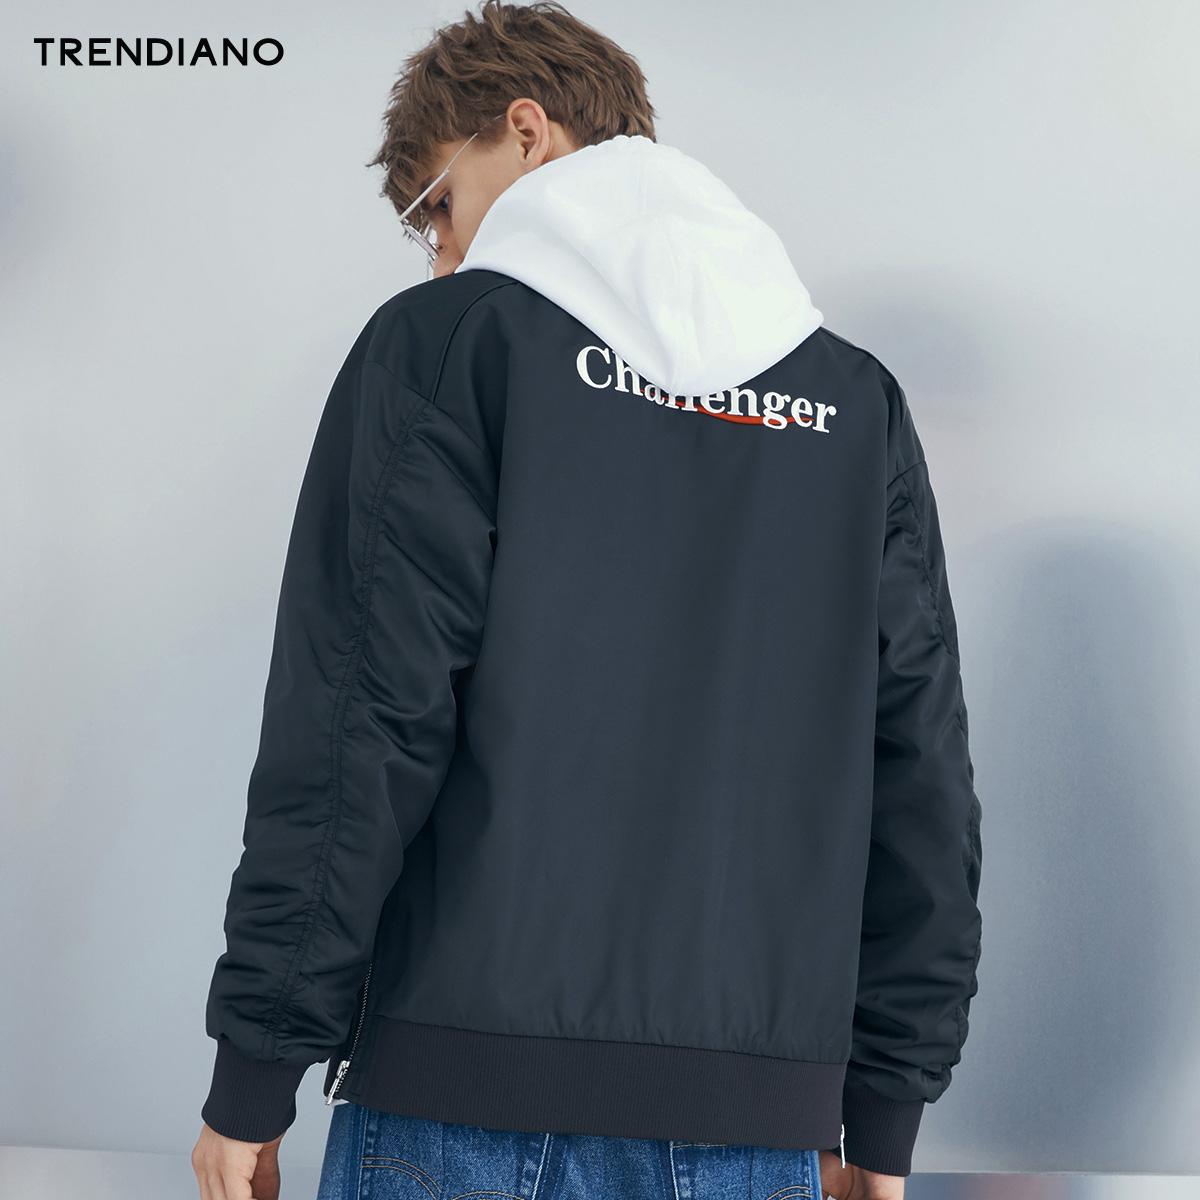 TRENDIANO男装秋装字母刺绣宽松棒球服夹克外套3GC304732P图片